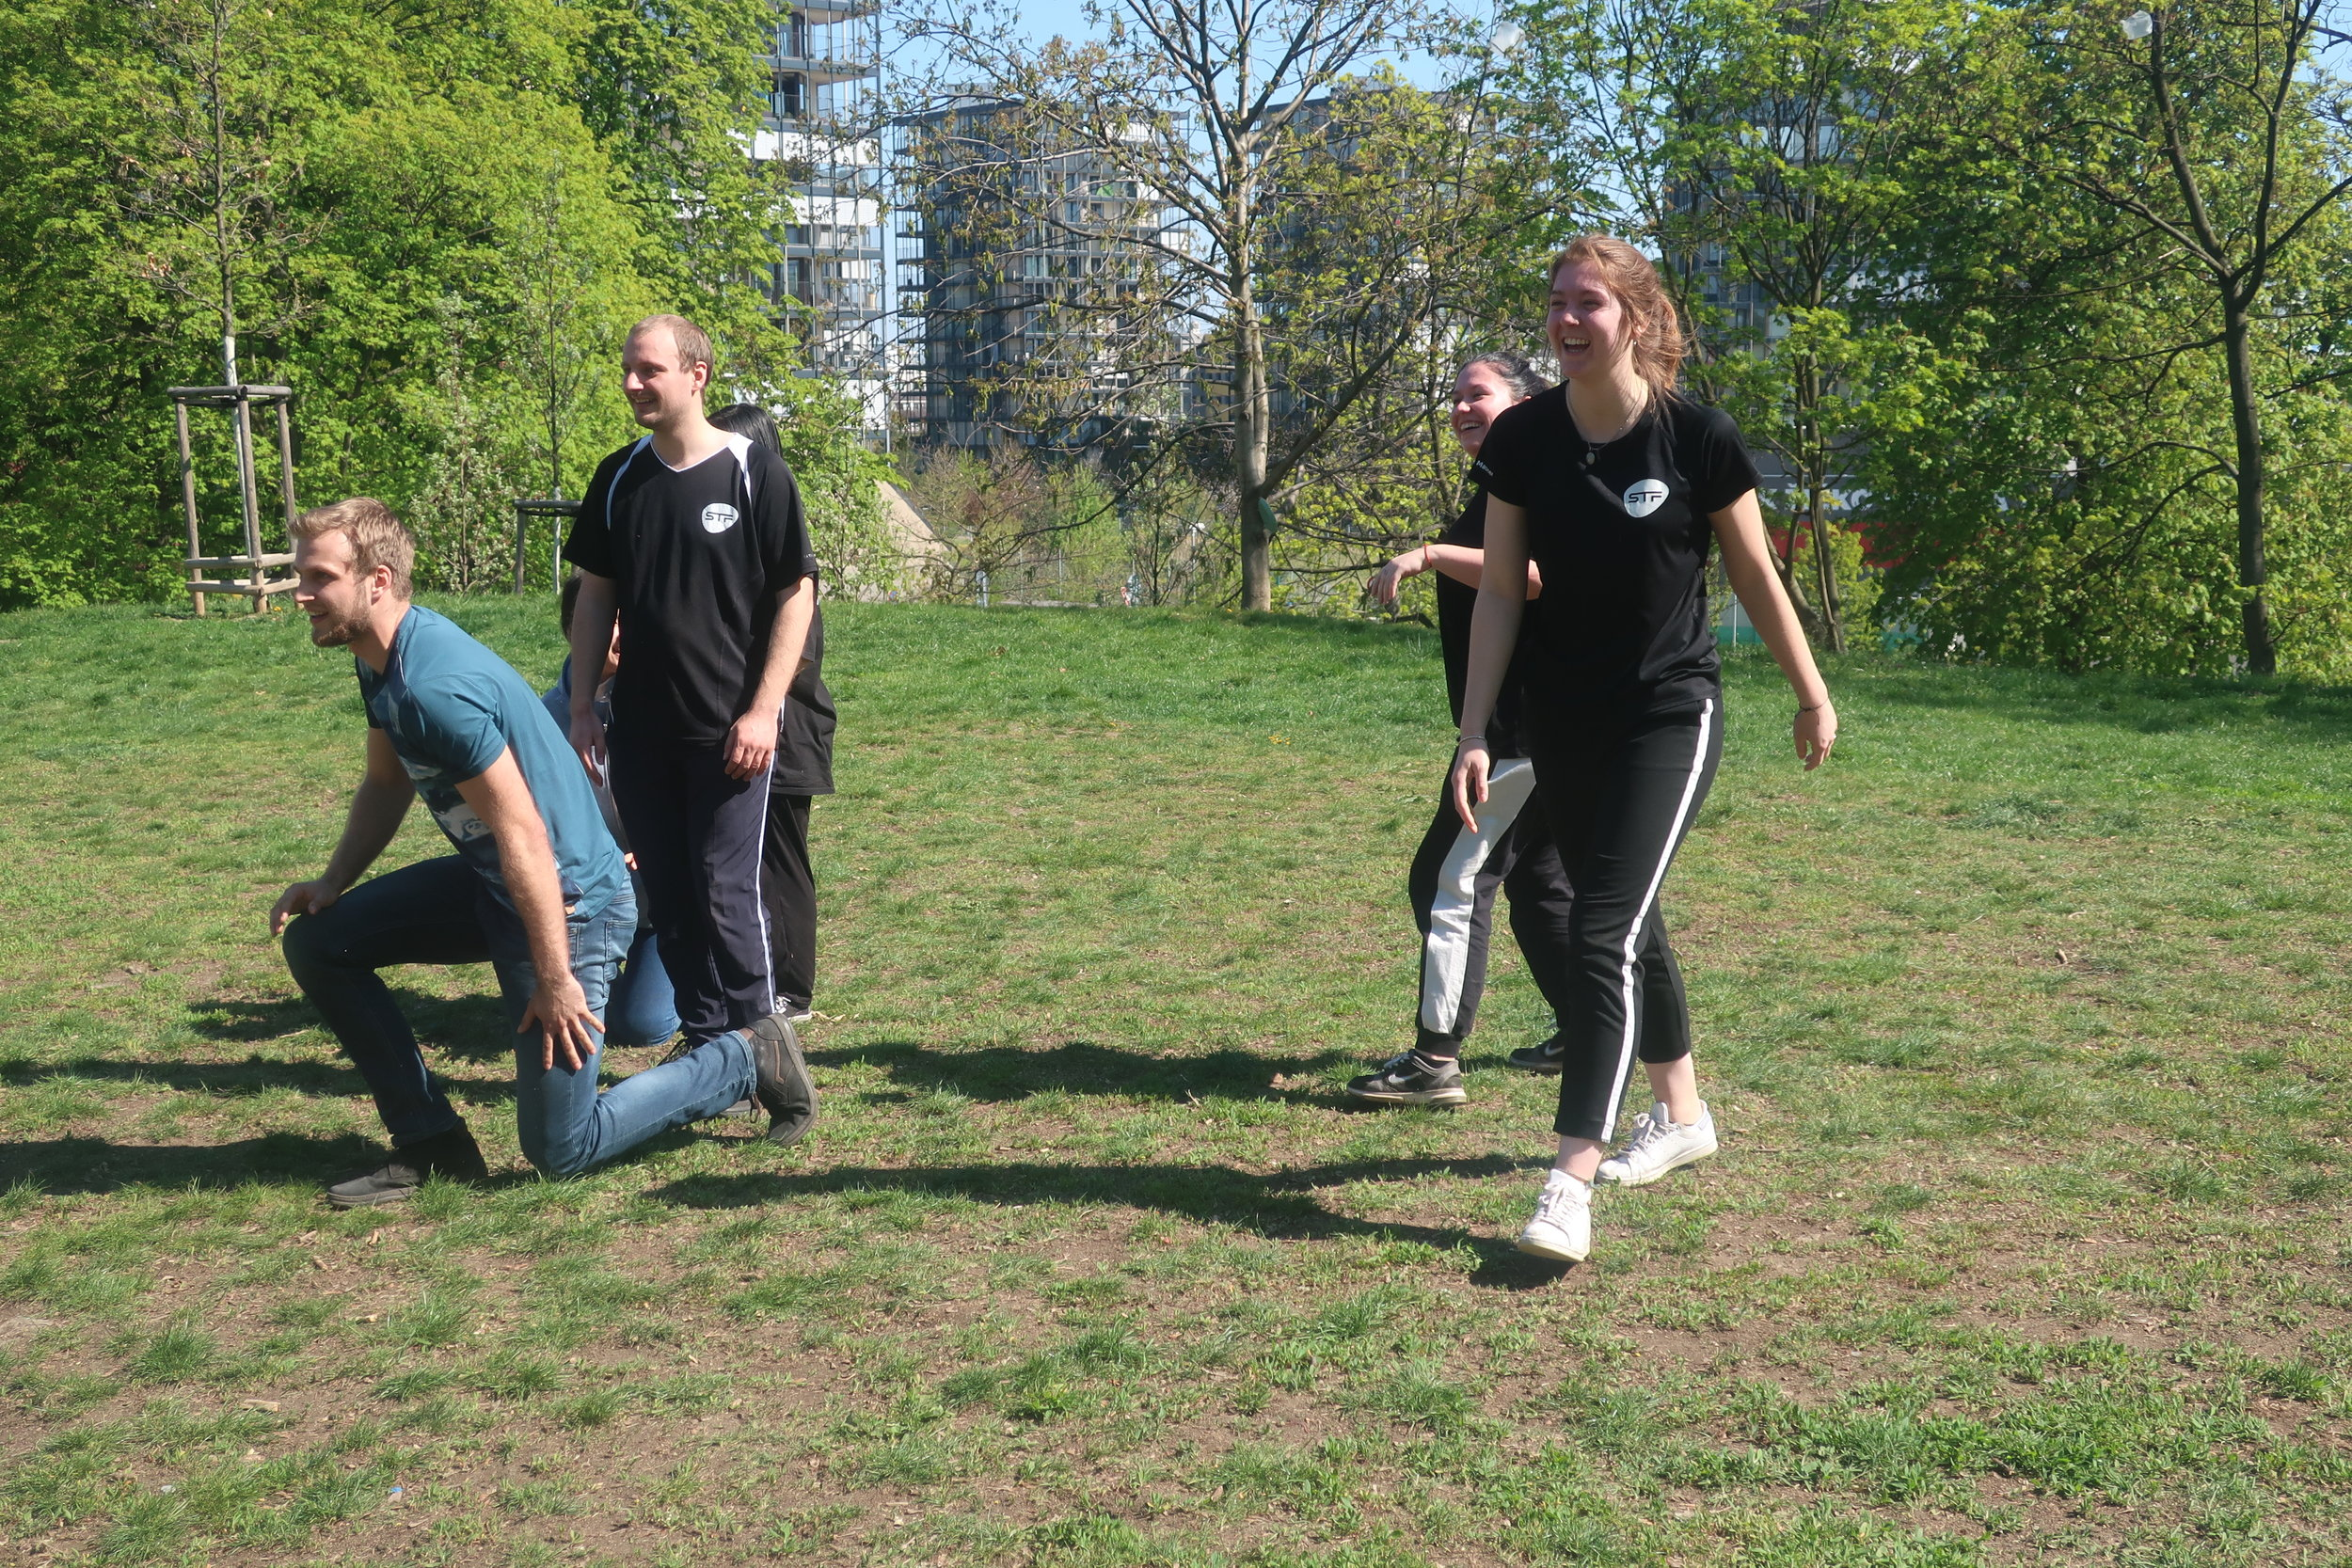 Sport activities in afternoon